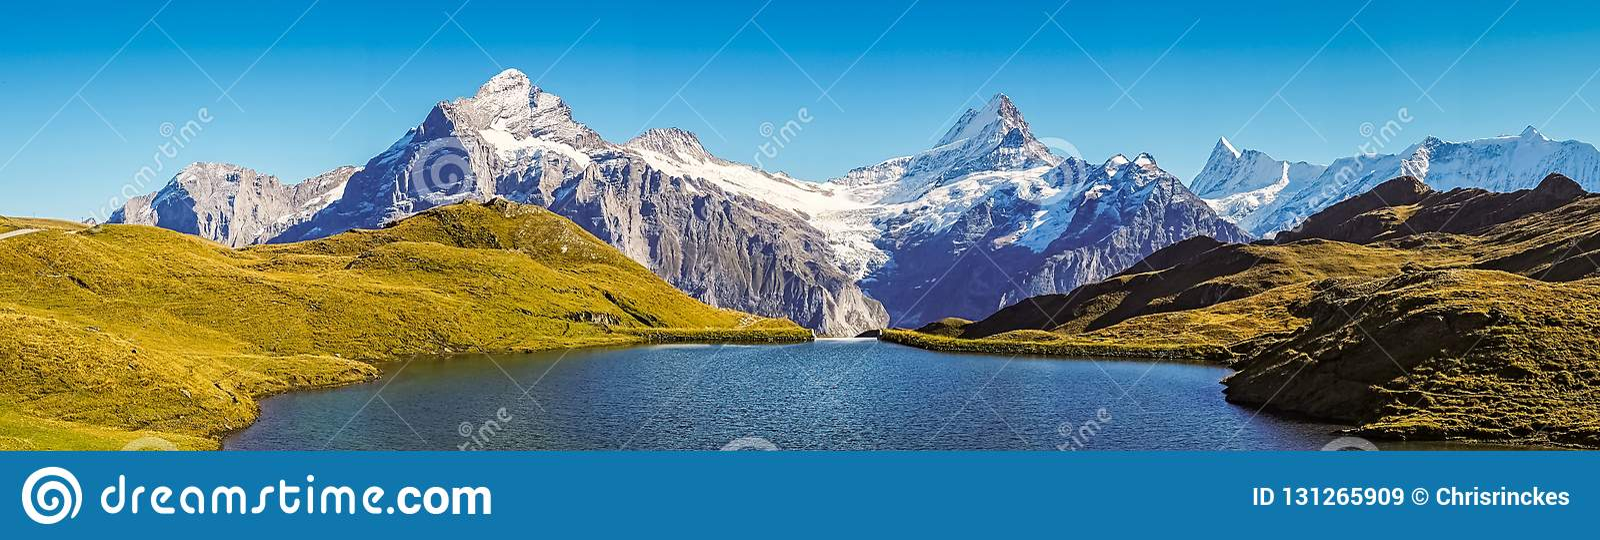 Encontrando Bachalpsee ao caminhar primeiramente aos cumes de Grindelwald Bernese, Suíça